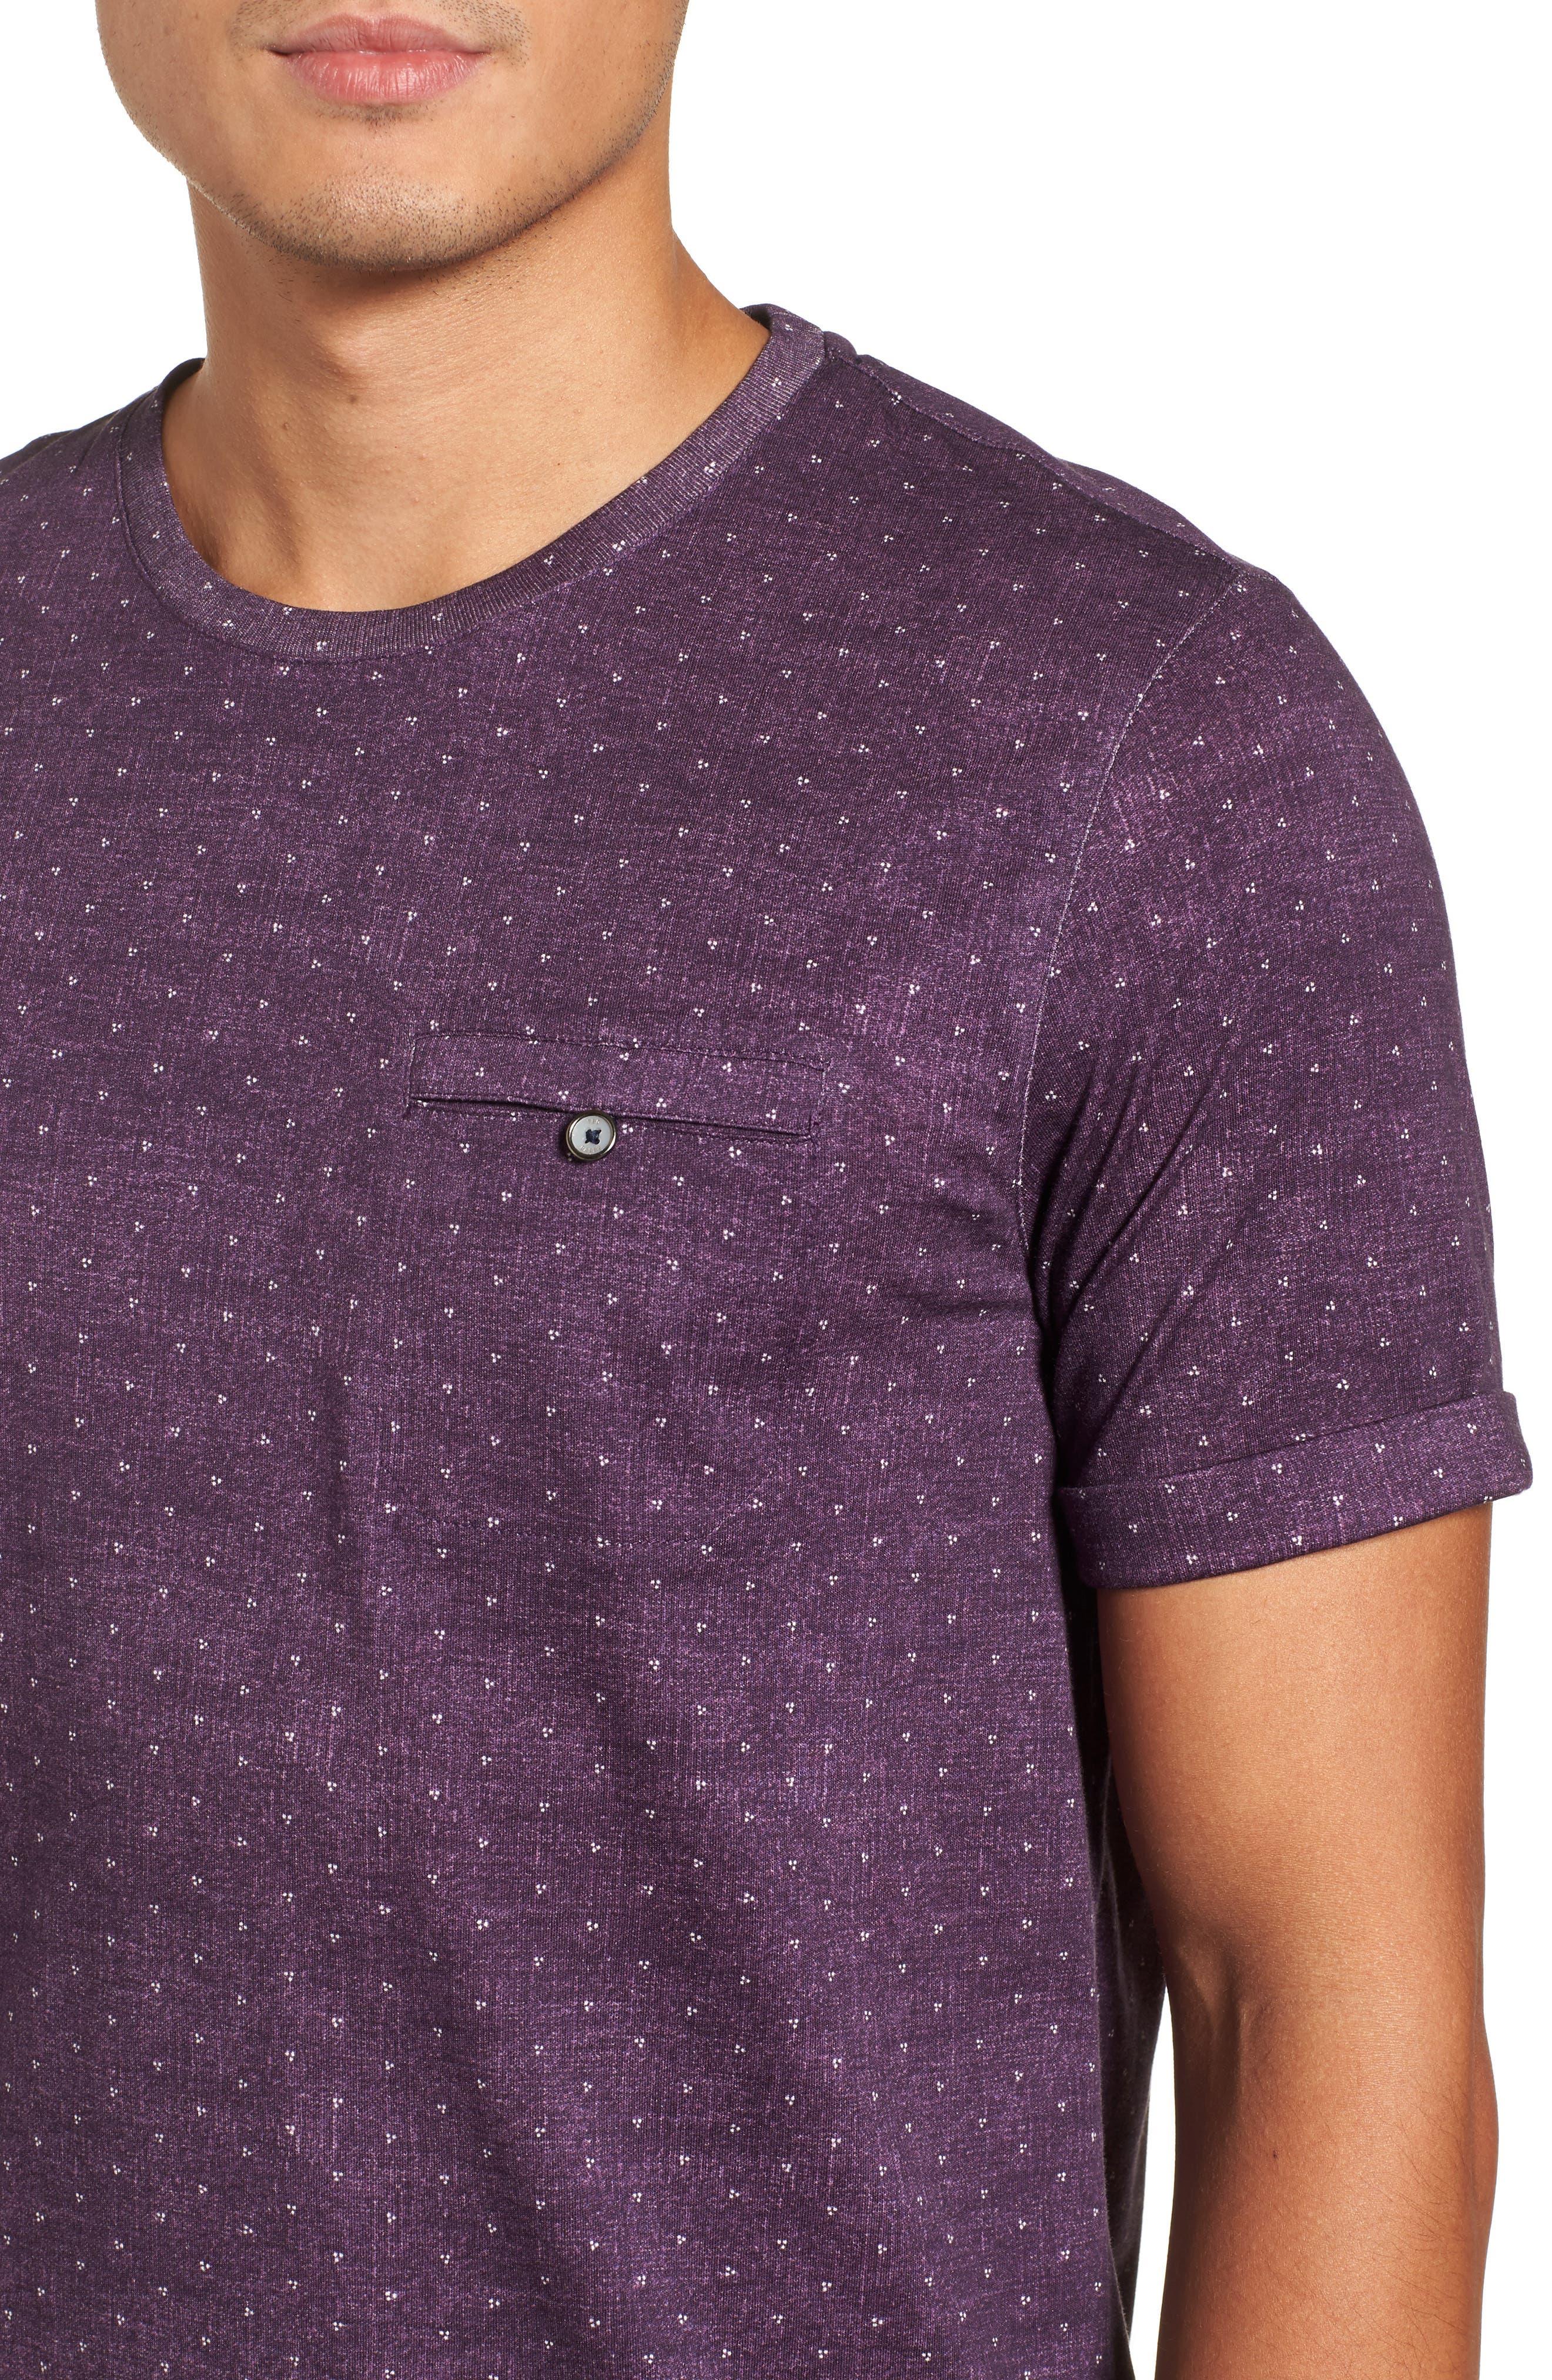 Giovani Modern Slim Fit Print T-Shirt,                             Alternate thumbnail 4, color,                             Purple